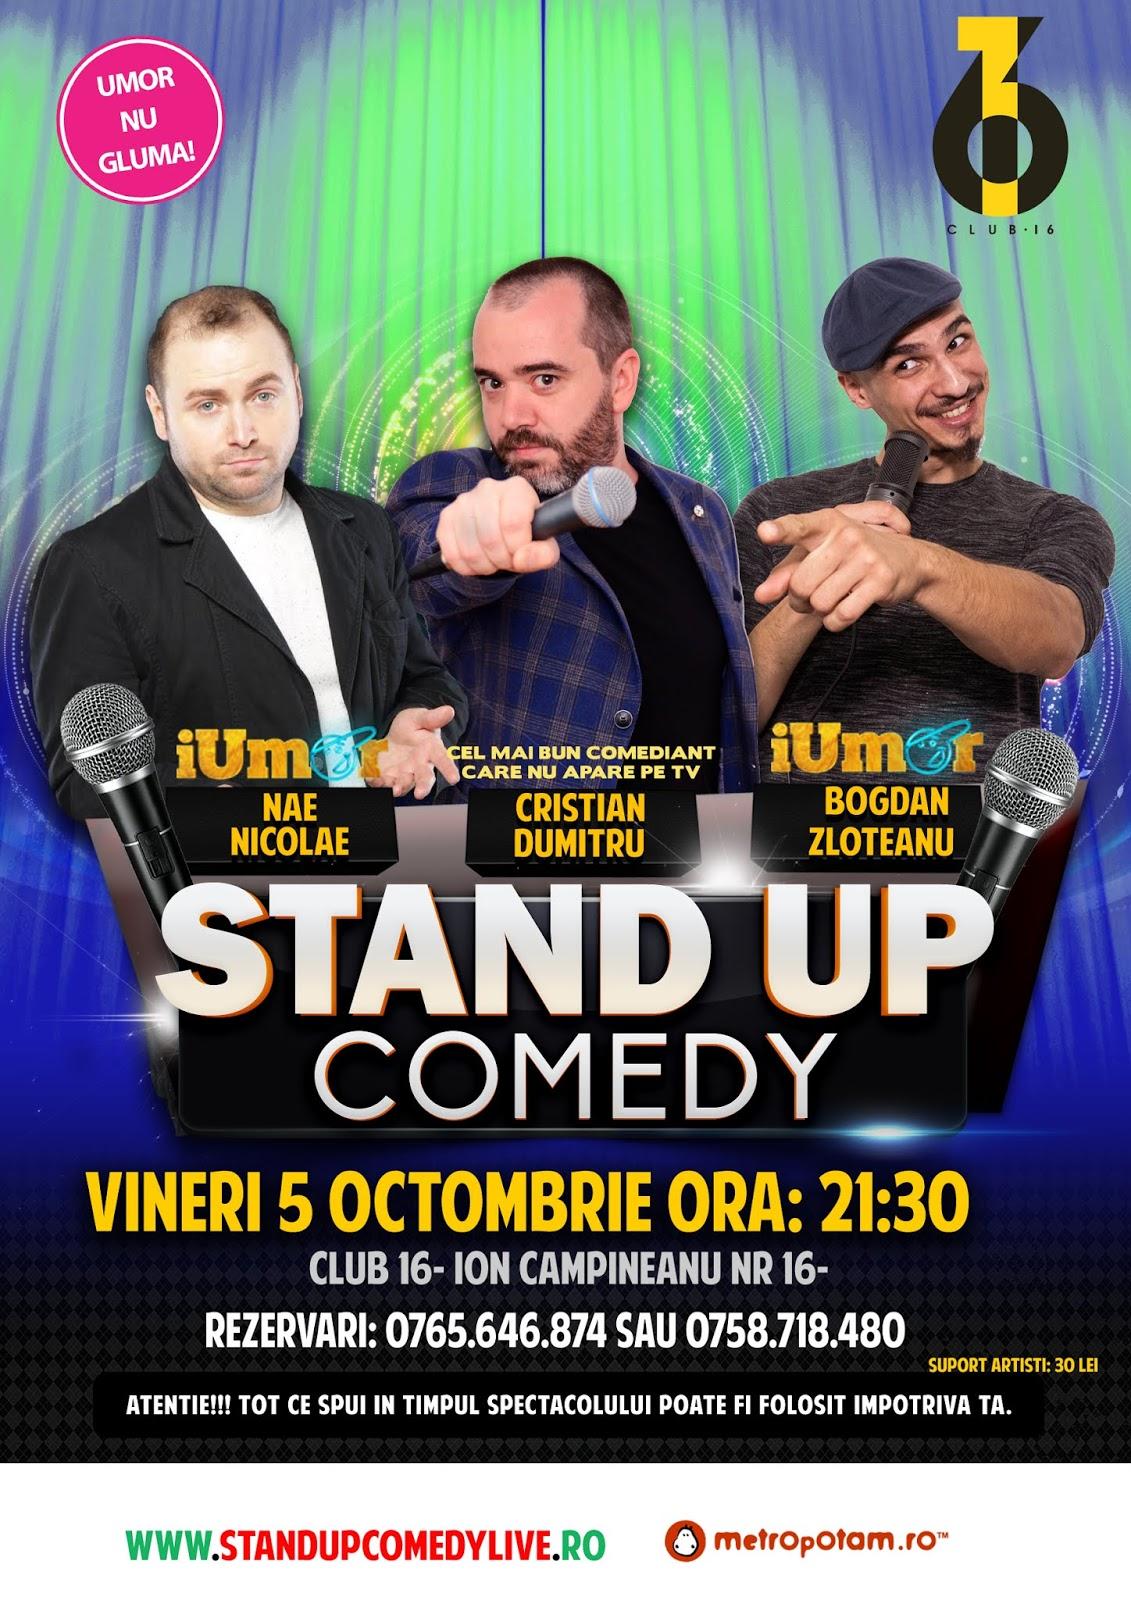 Stand-up Comedy Bucuresti Vineri